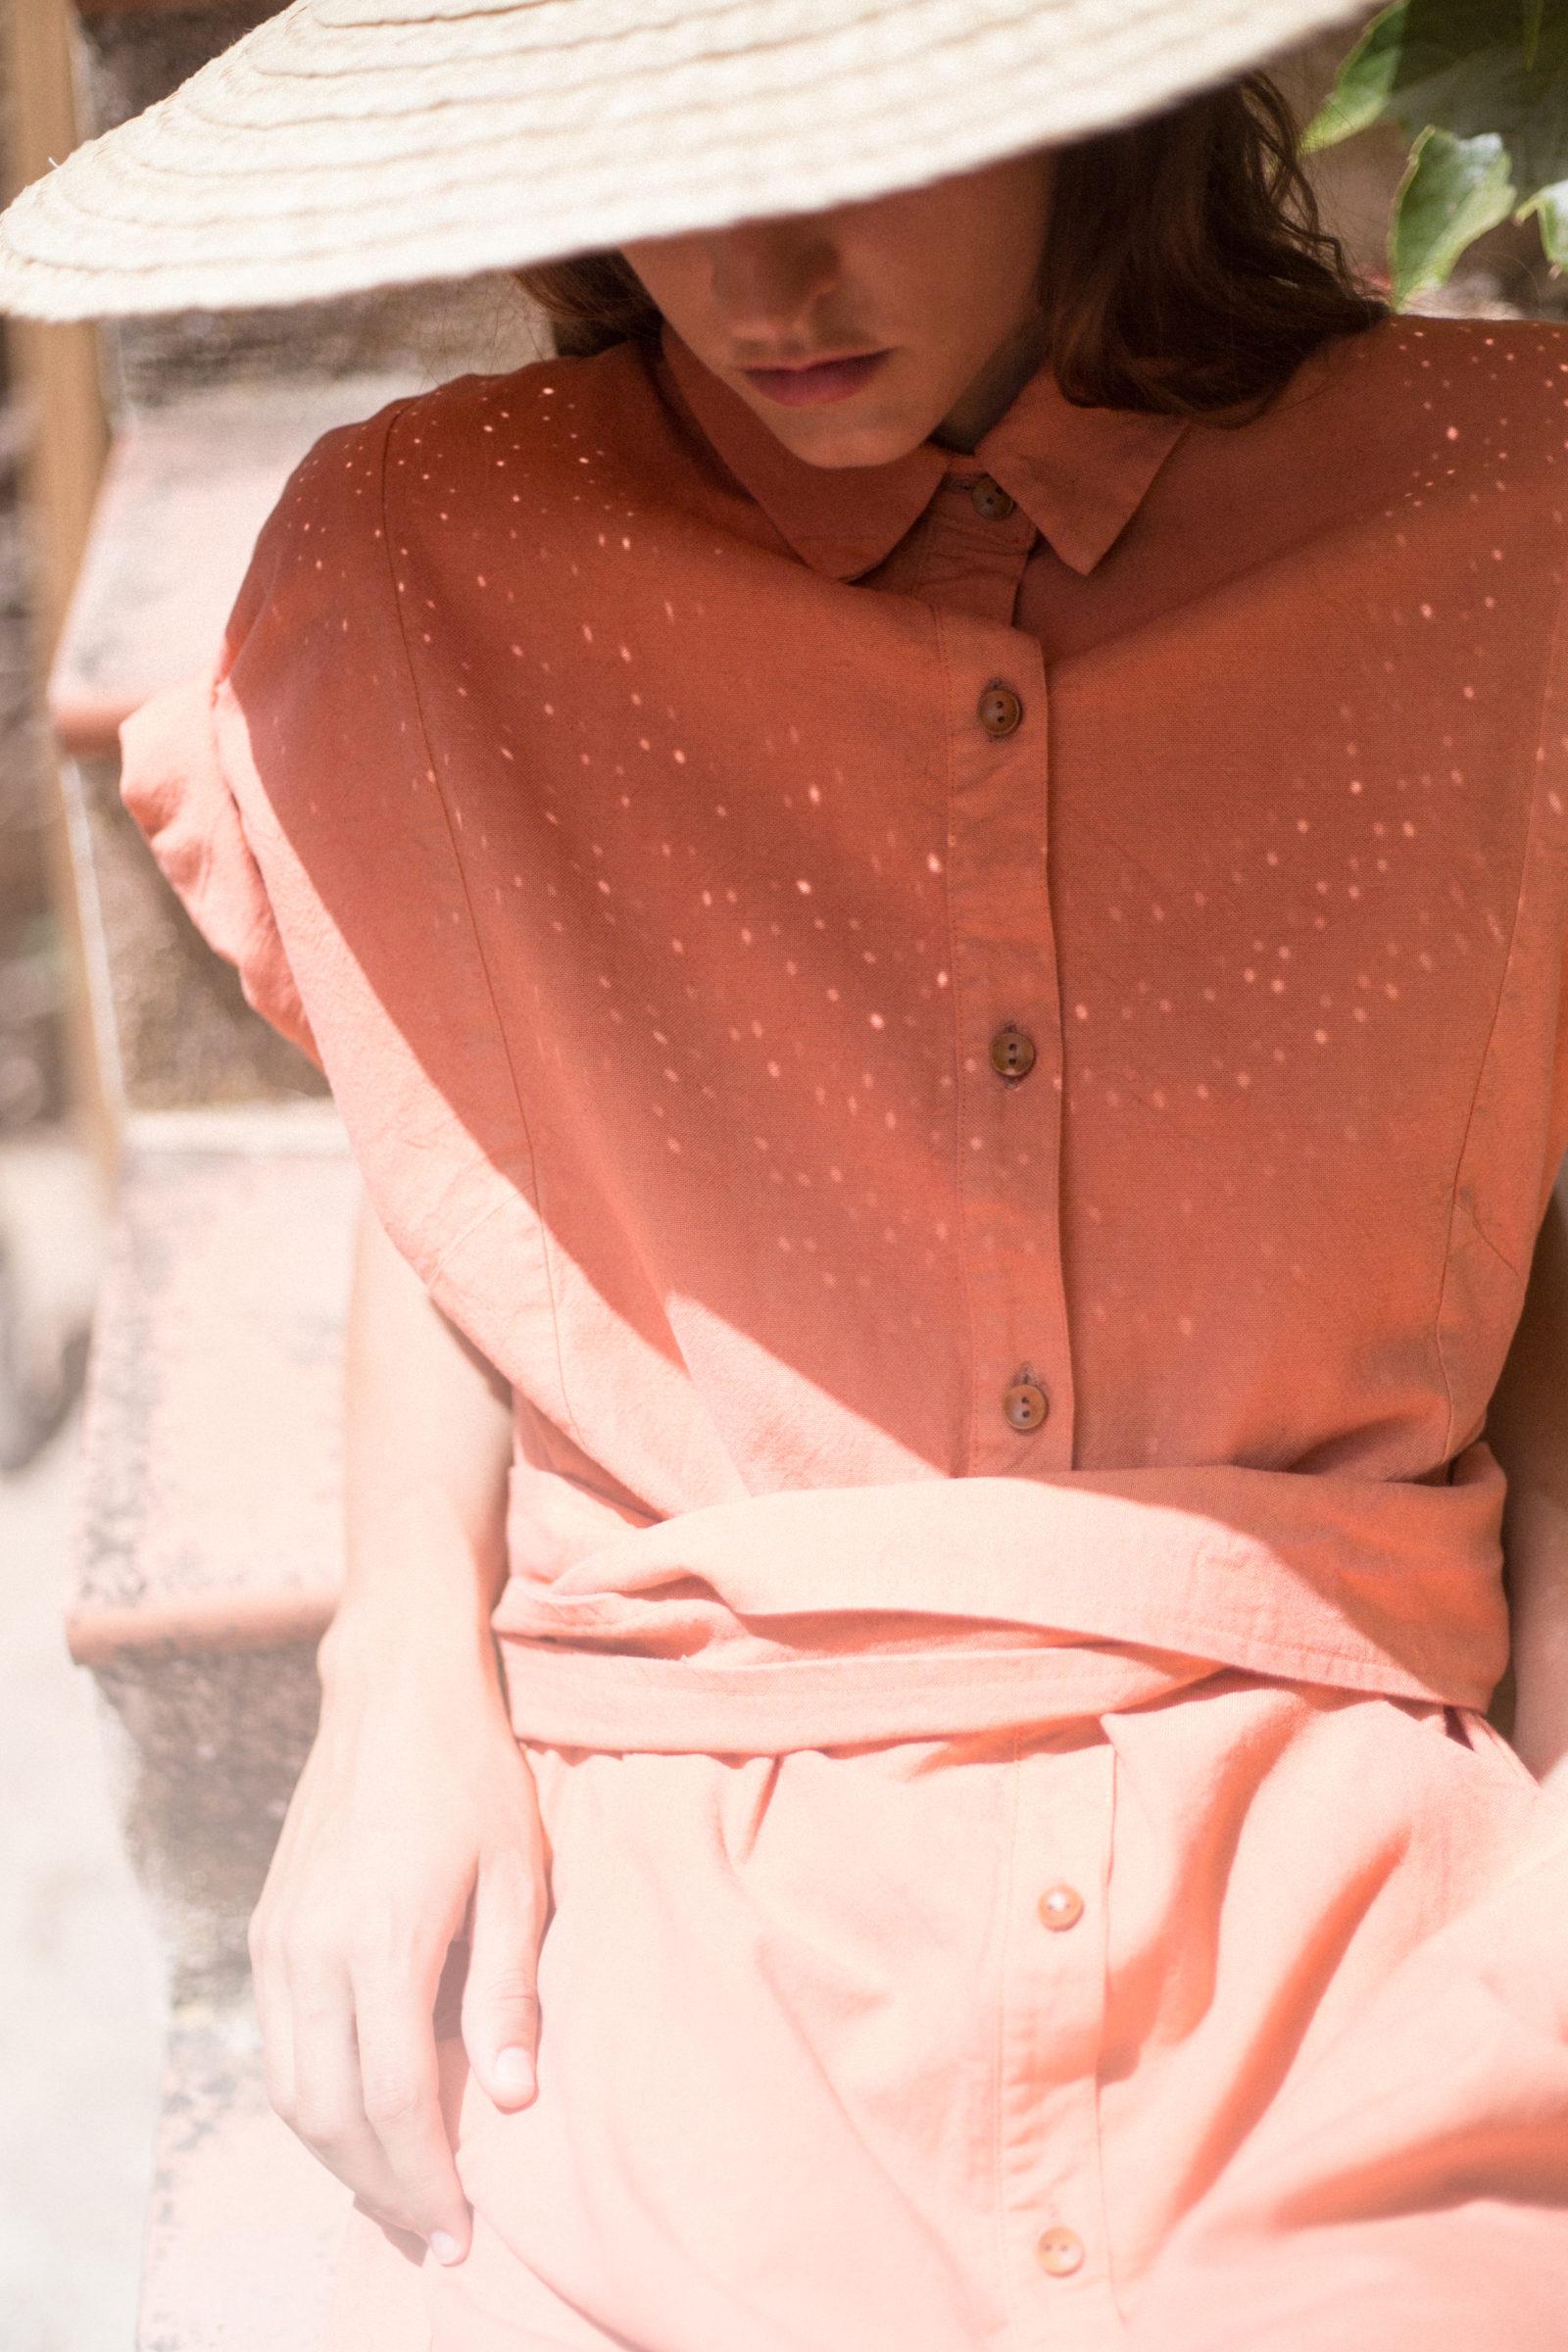 Suite 13 | Womenswear from Palma de Mallorca | Frühjahr/Sommer 2017 Kollektion | Foto: Suite 13 | GROSS∆RTIG